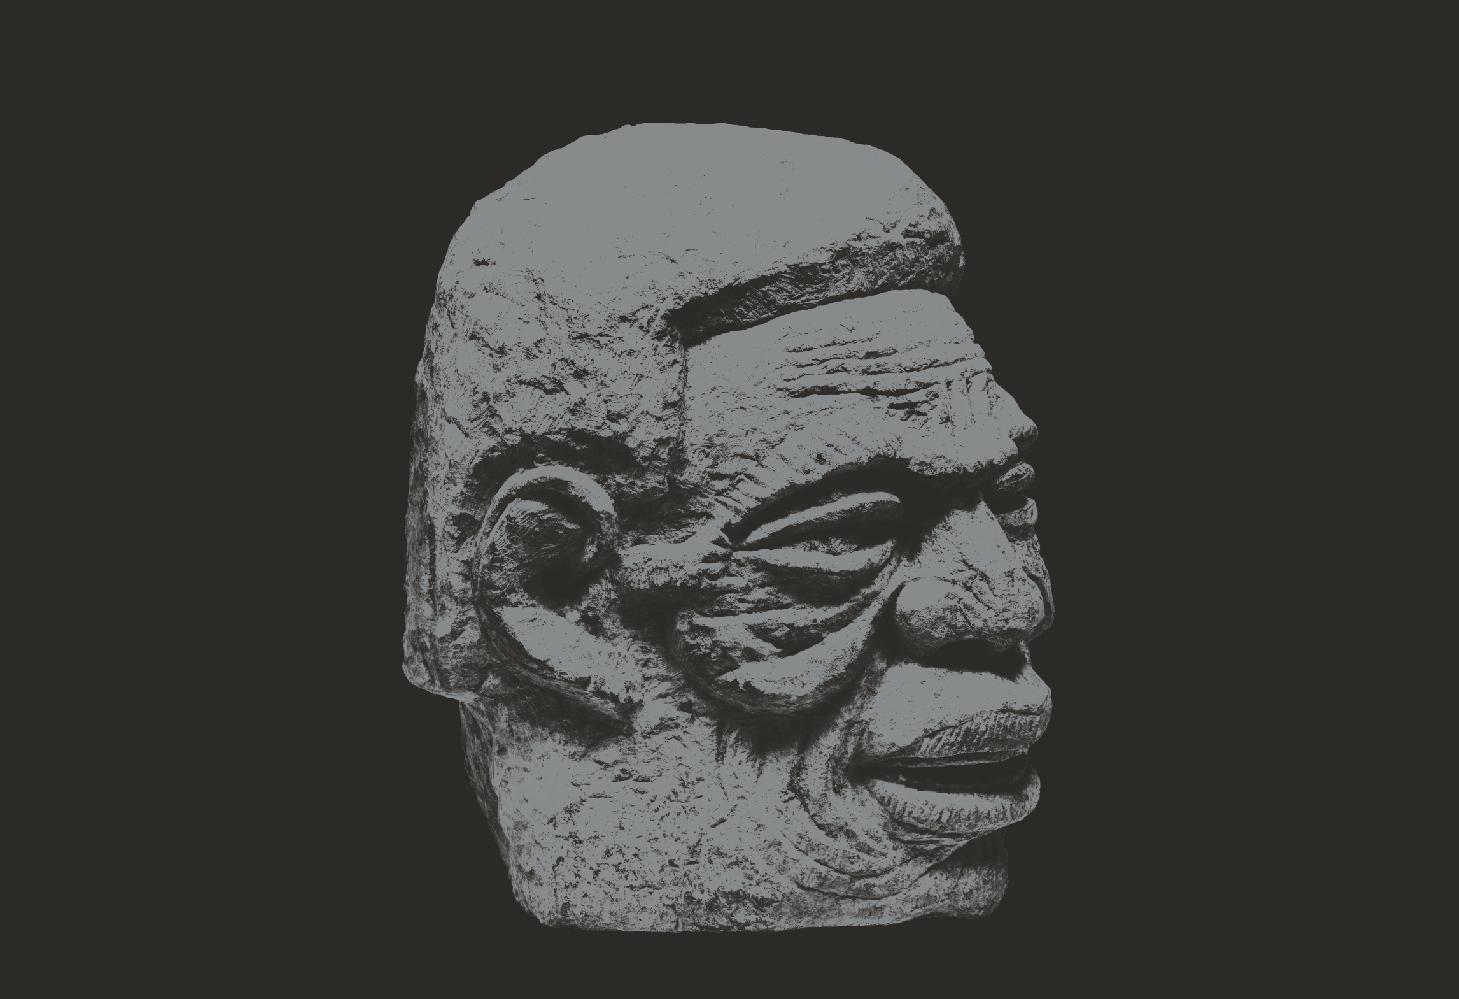 Feature potoprenshead 01